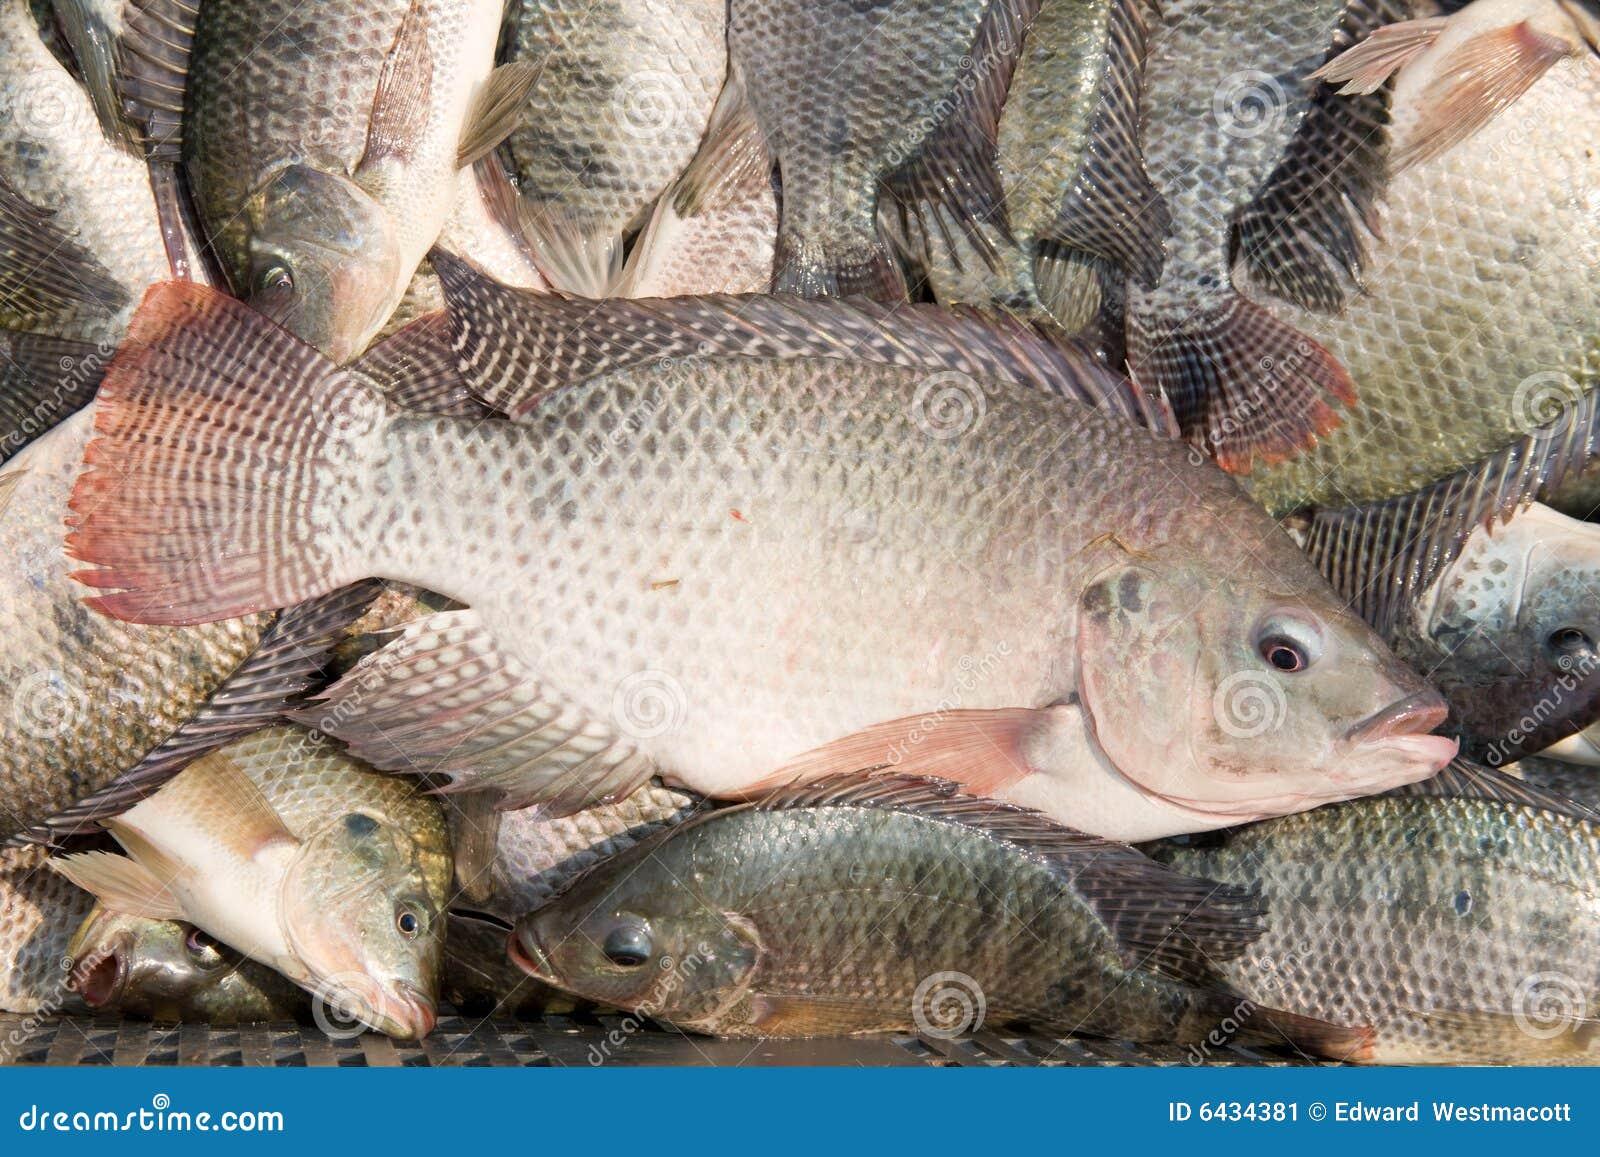 how to cook fresh tilapia fish